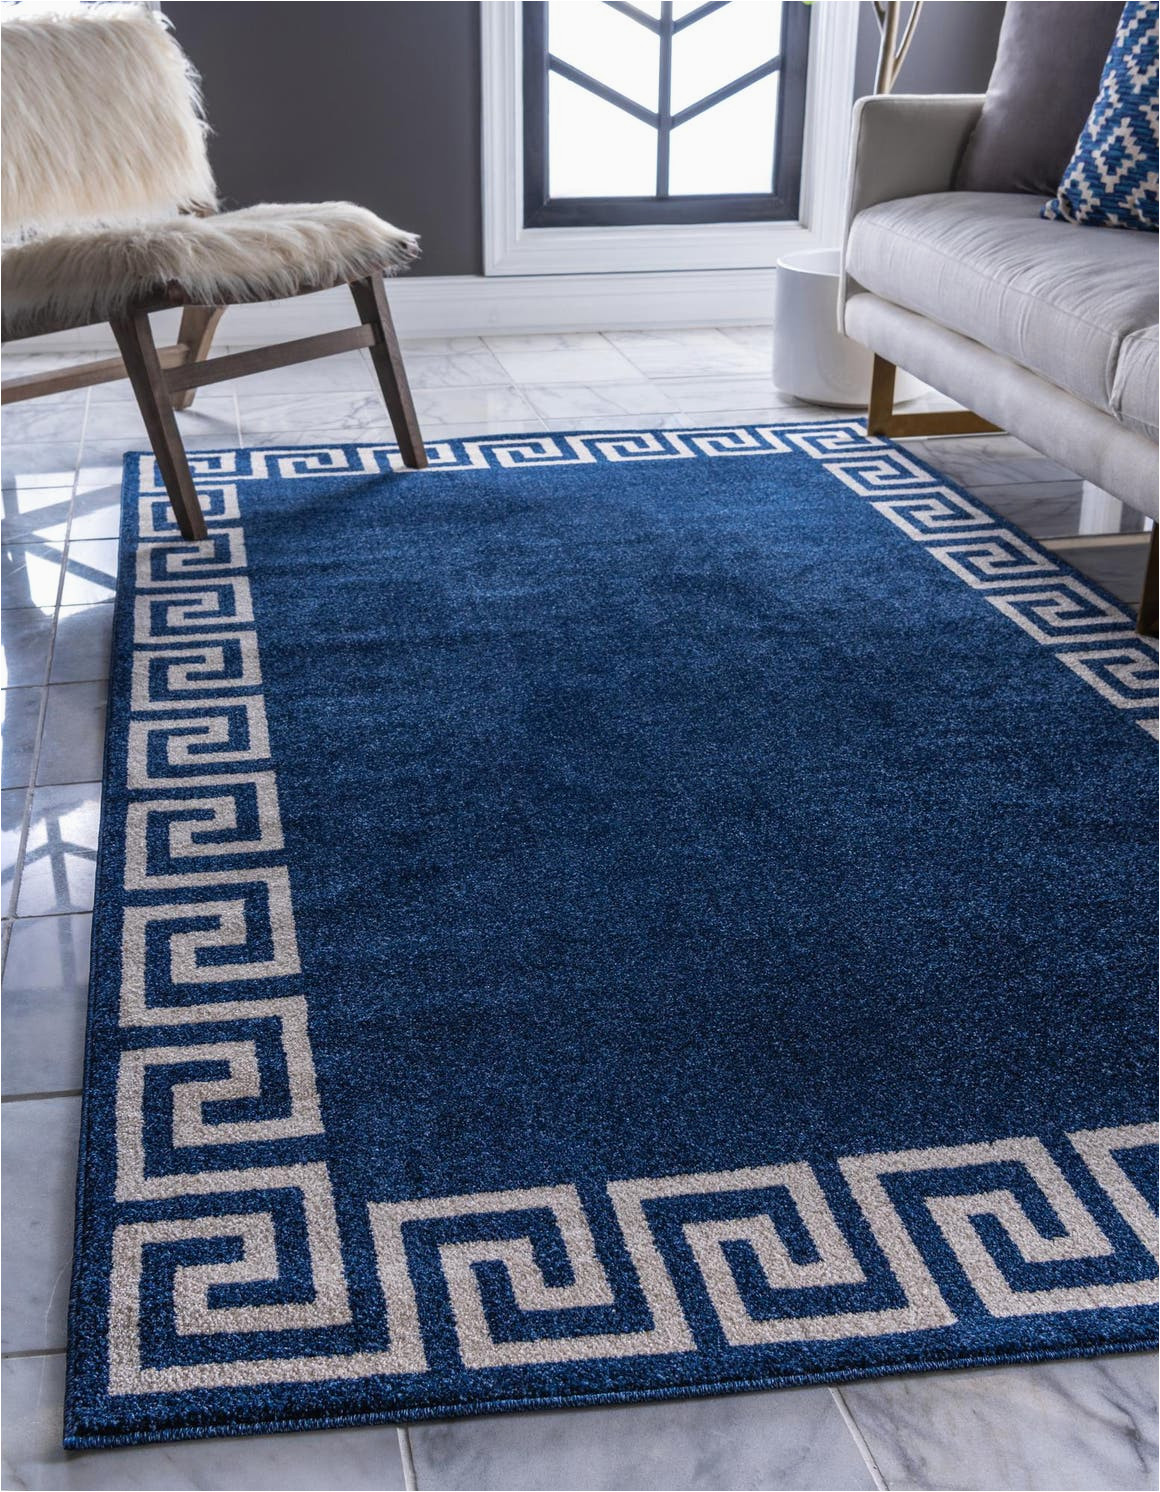 navy blue 3x5 greek key area rug 33123805